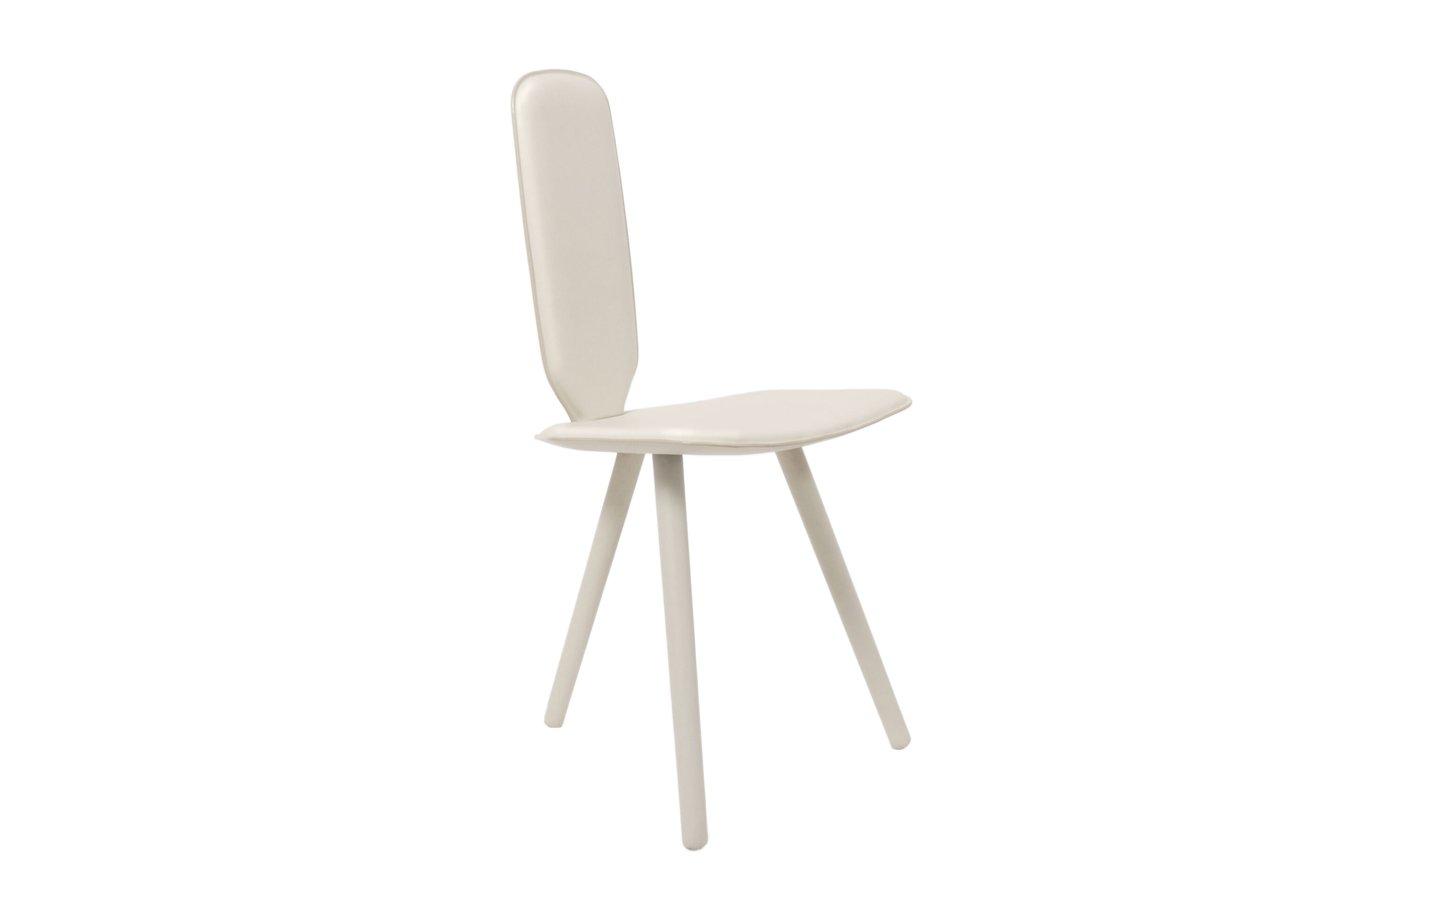 stool chair dubai are lift chairs covered by medicare bavaresk   fabiia - dubai, uae